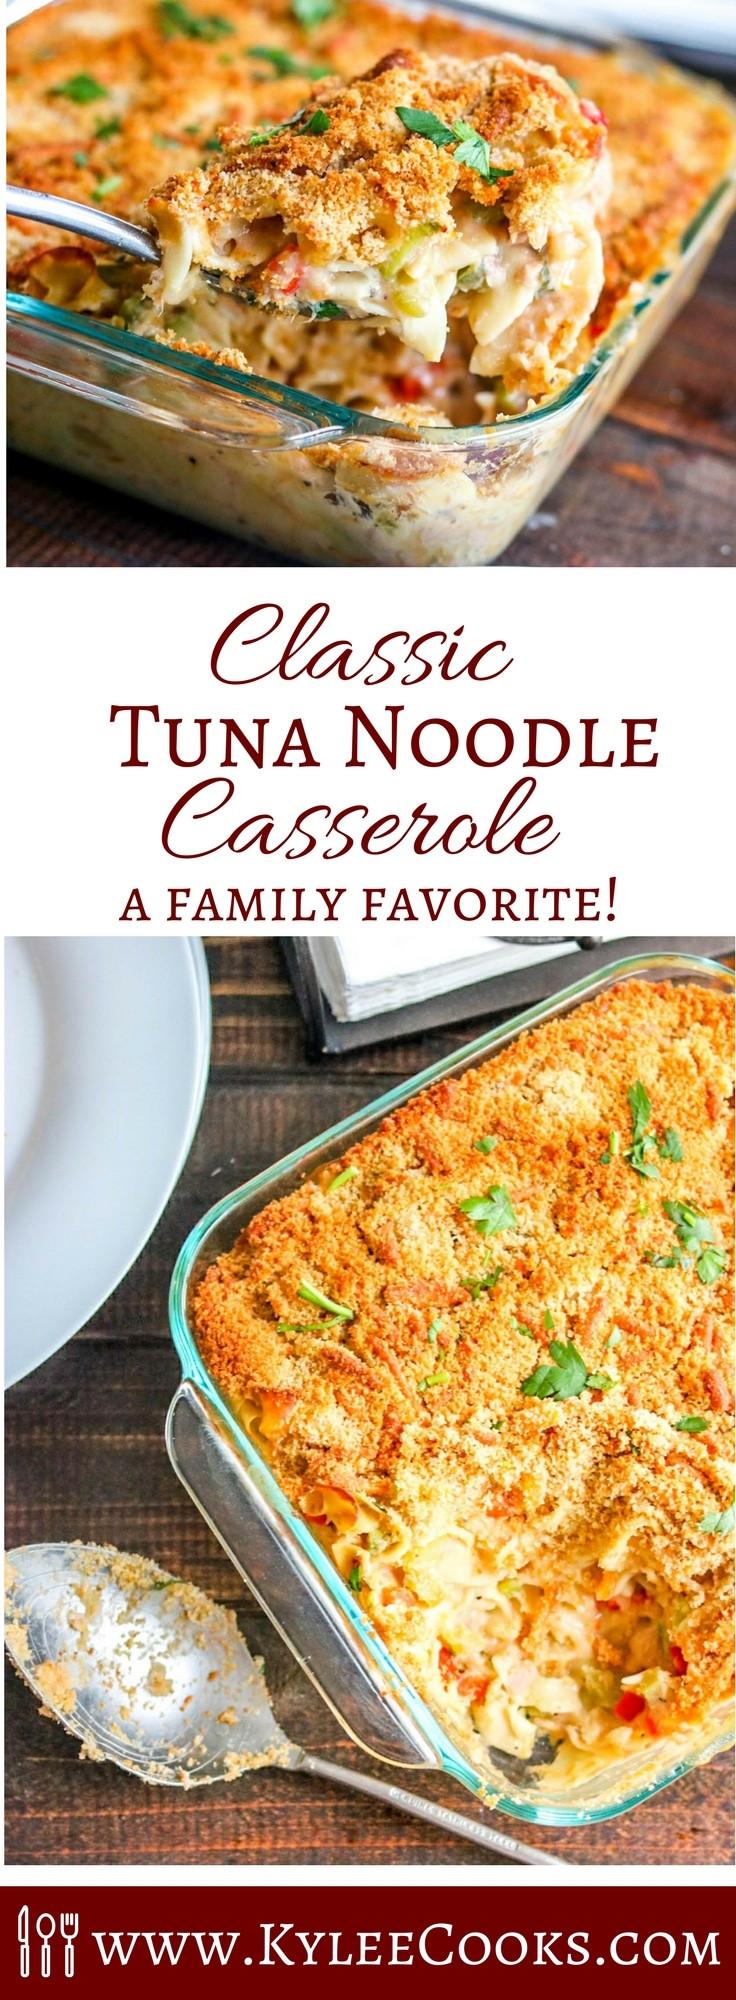 Classic Tuna Casserole  Weeknight Classic Tuna Noodle Casserole Kylee Cooks